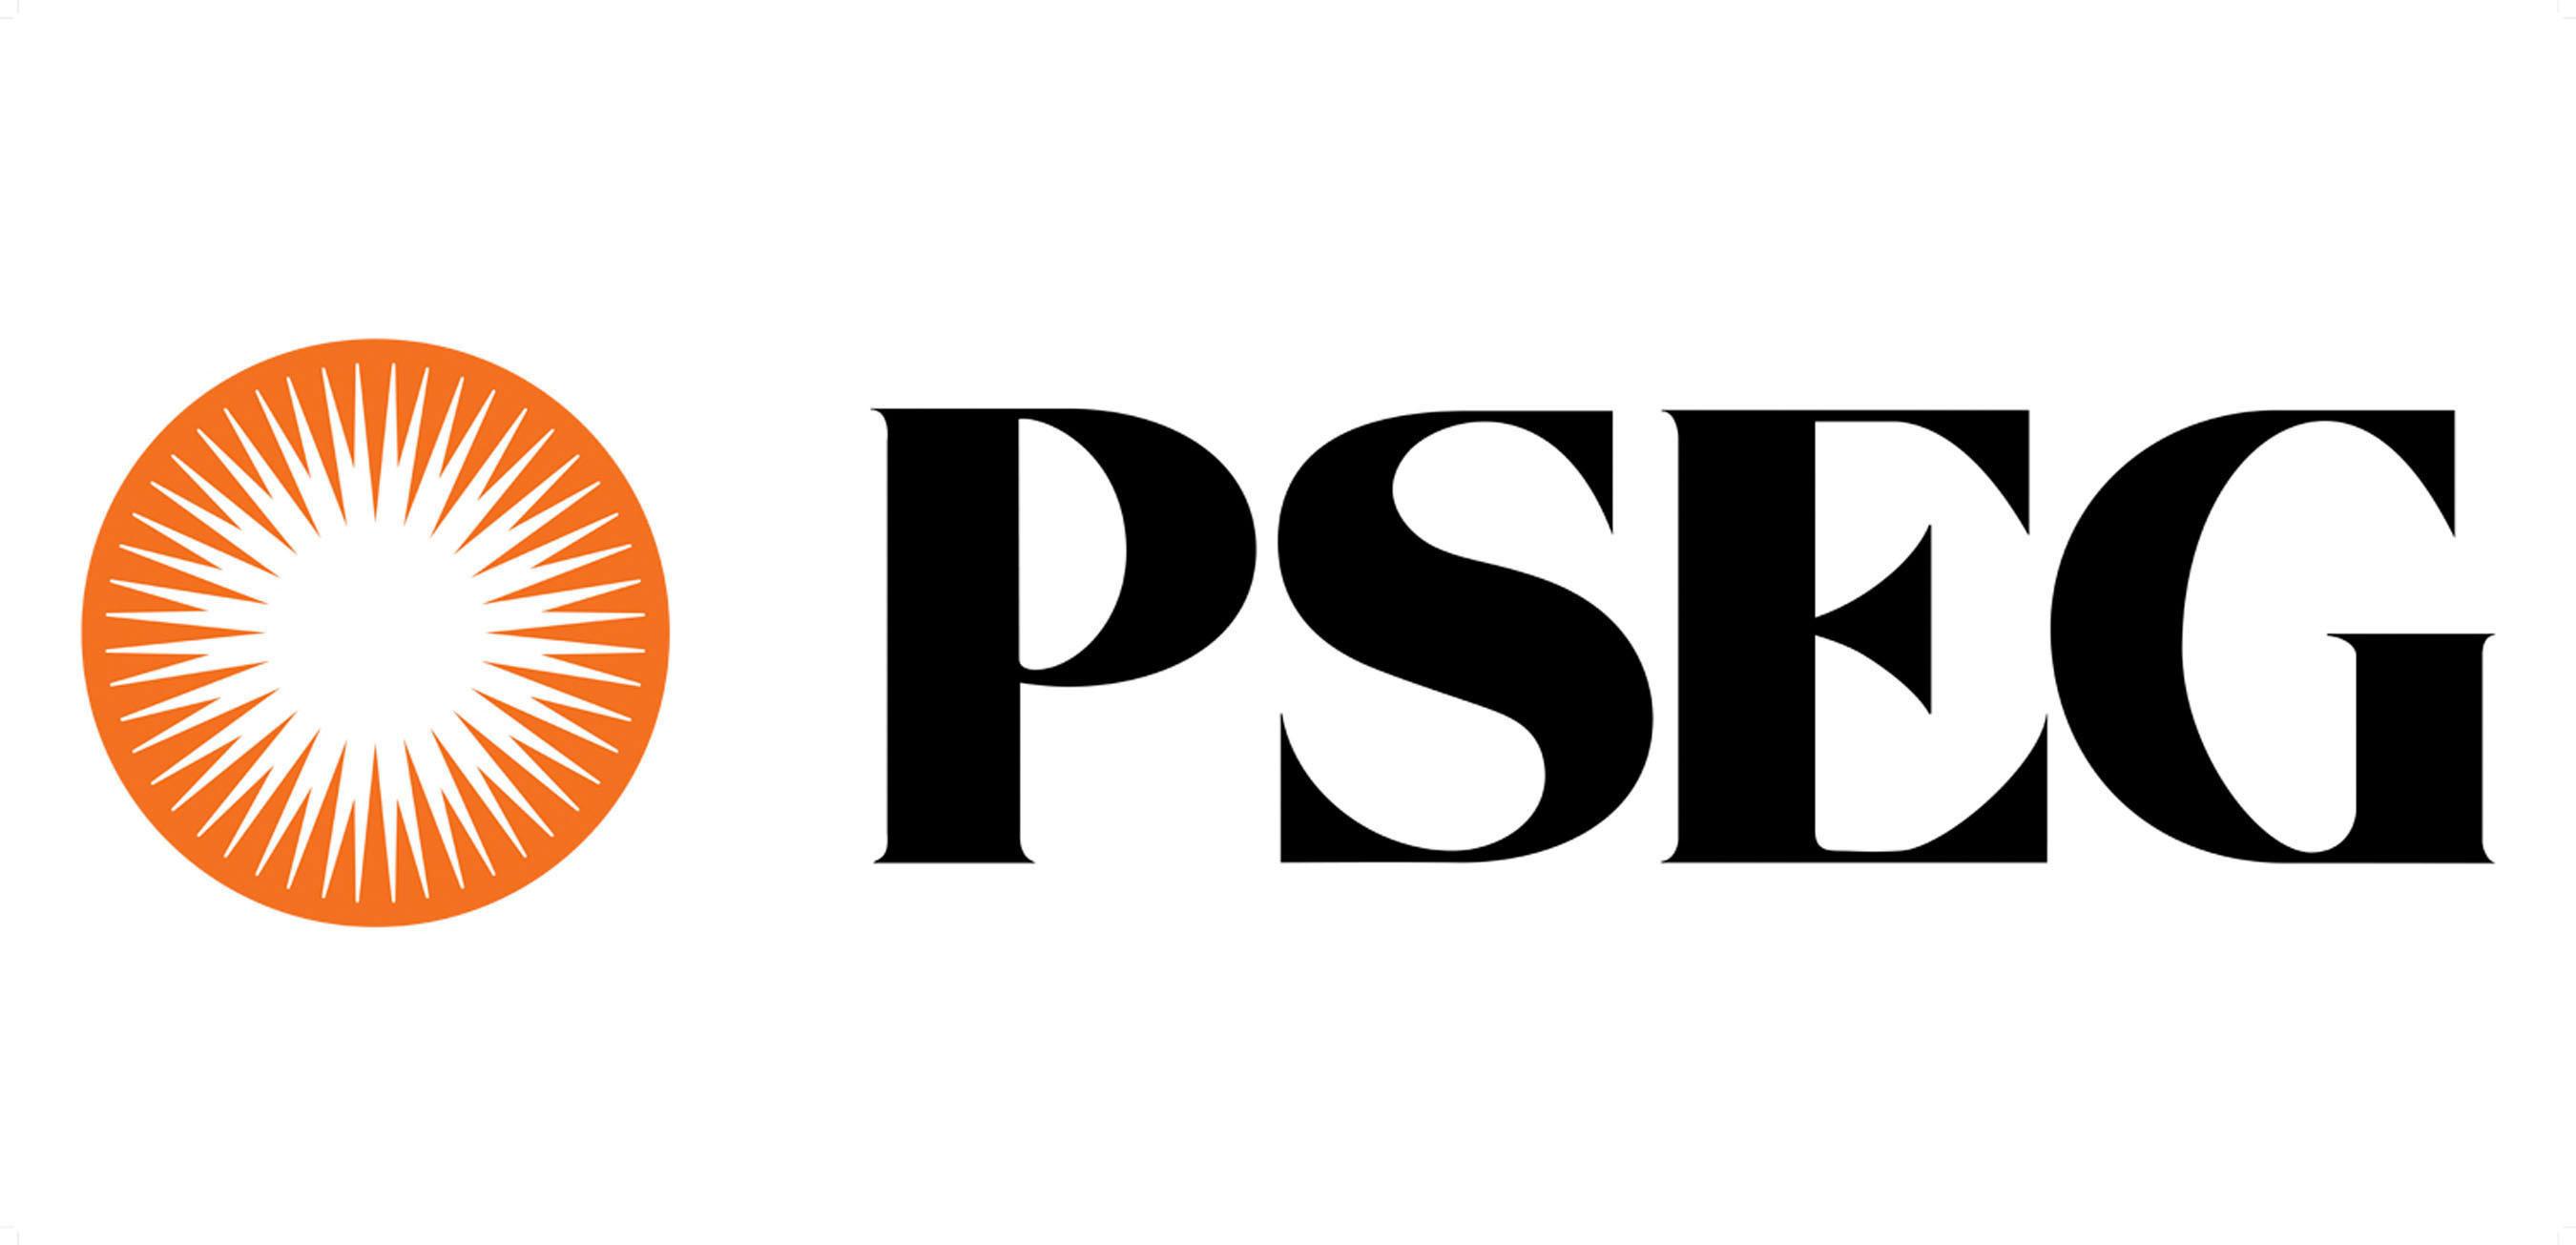 PSEG Bill Payment: NJ PSEG Bill Pay Online - Public Service Electric and Gas